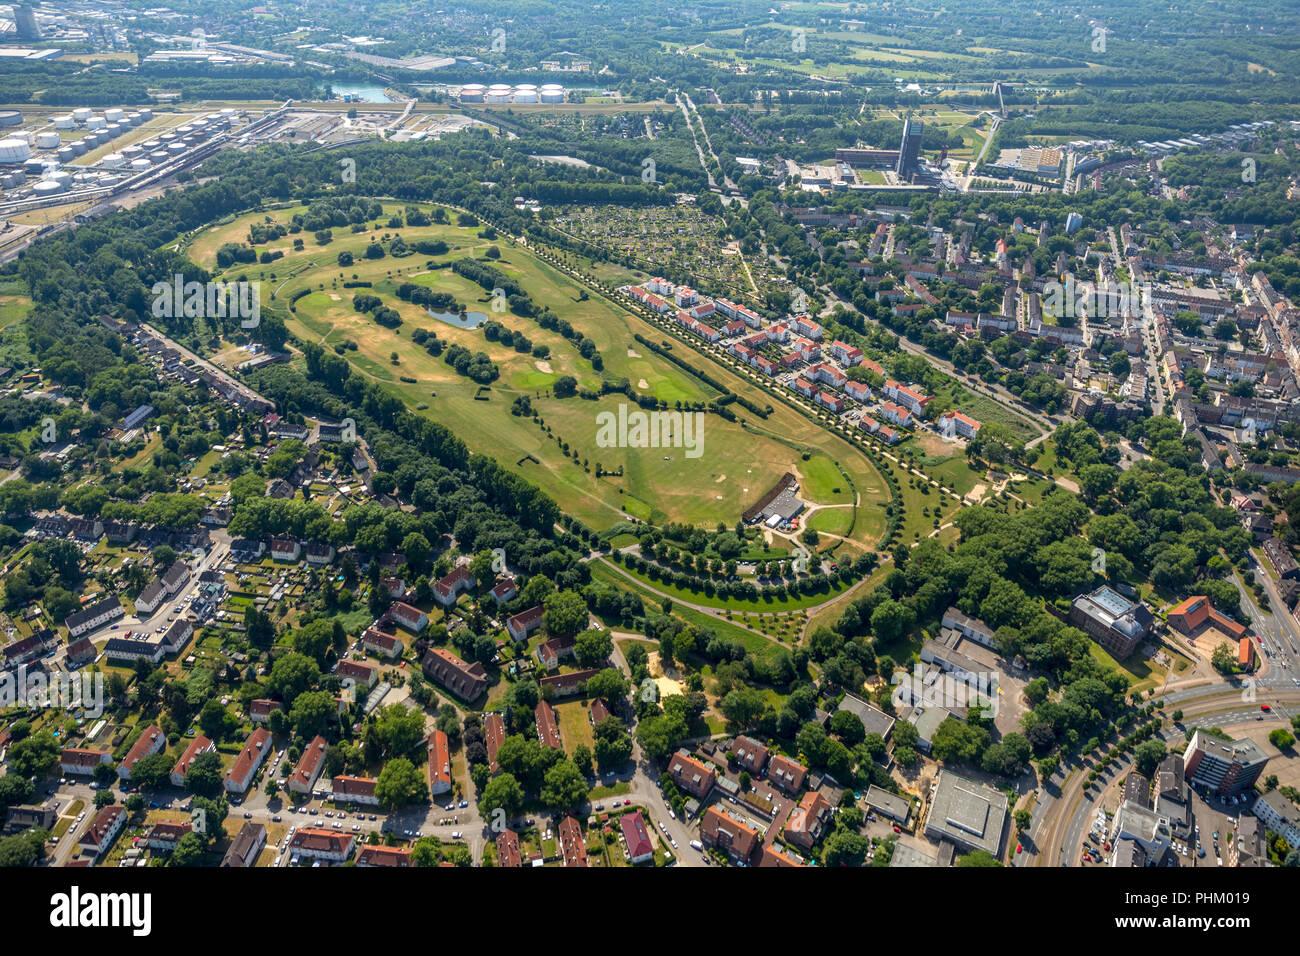 Foto aérea, Golfanlage Schloss Horst, antigua pista de trote Horst, Schloss Horst, zona residencial, casas unifamiliares, edificios de apartamentos, Gelse Imagen De Stock